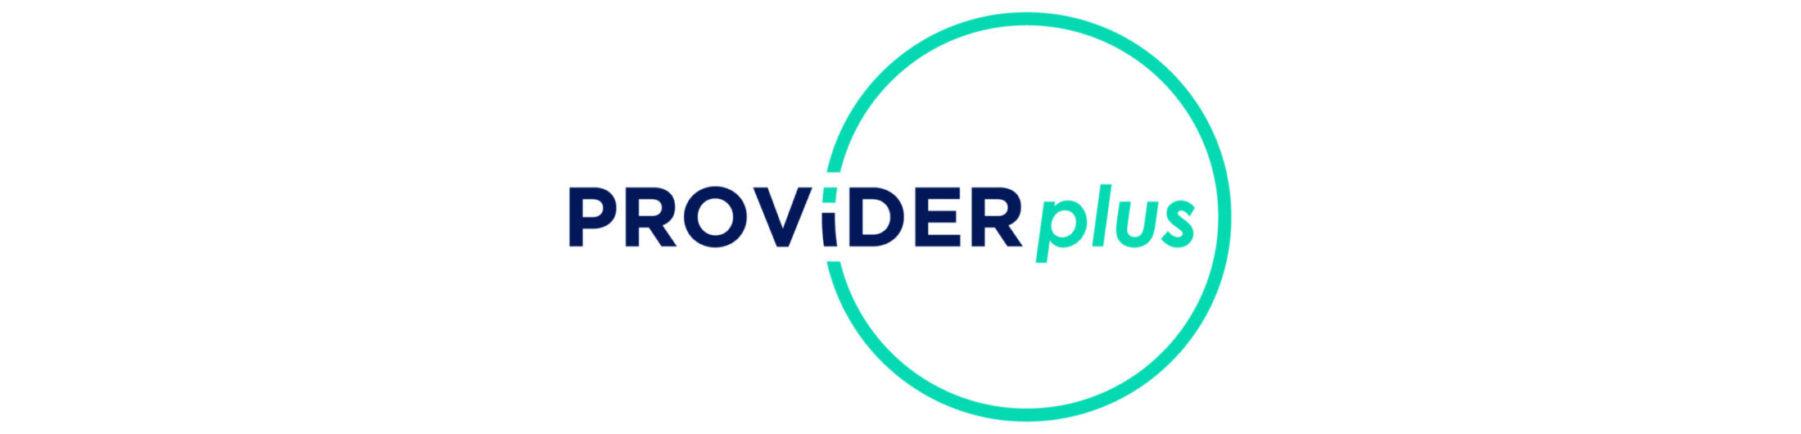 PROVIDERplus Members